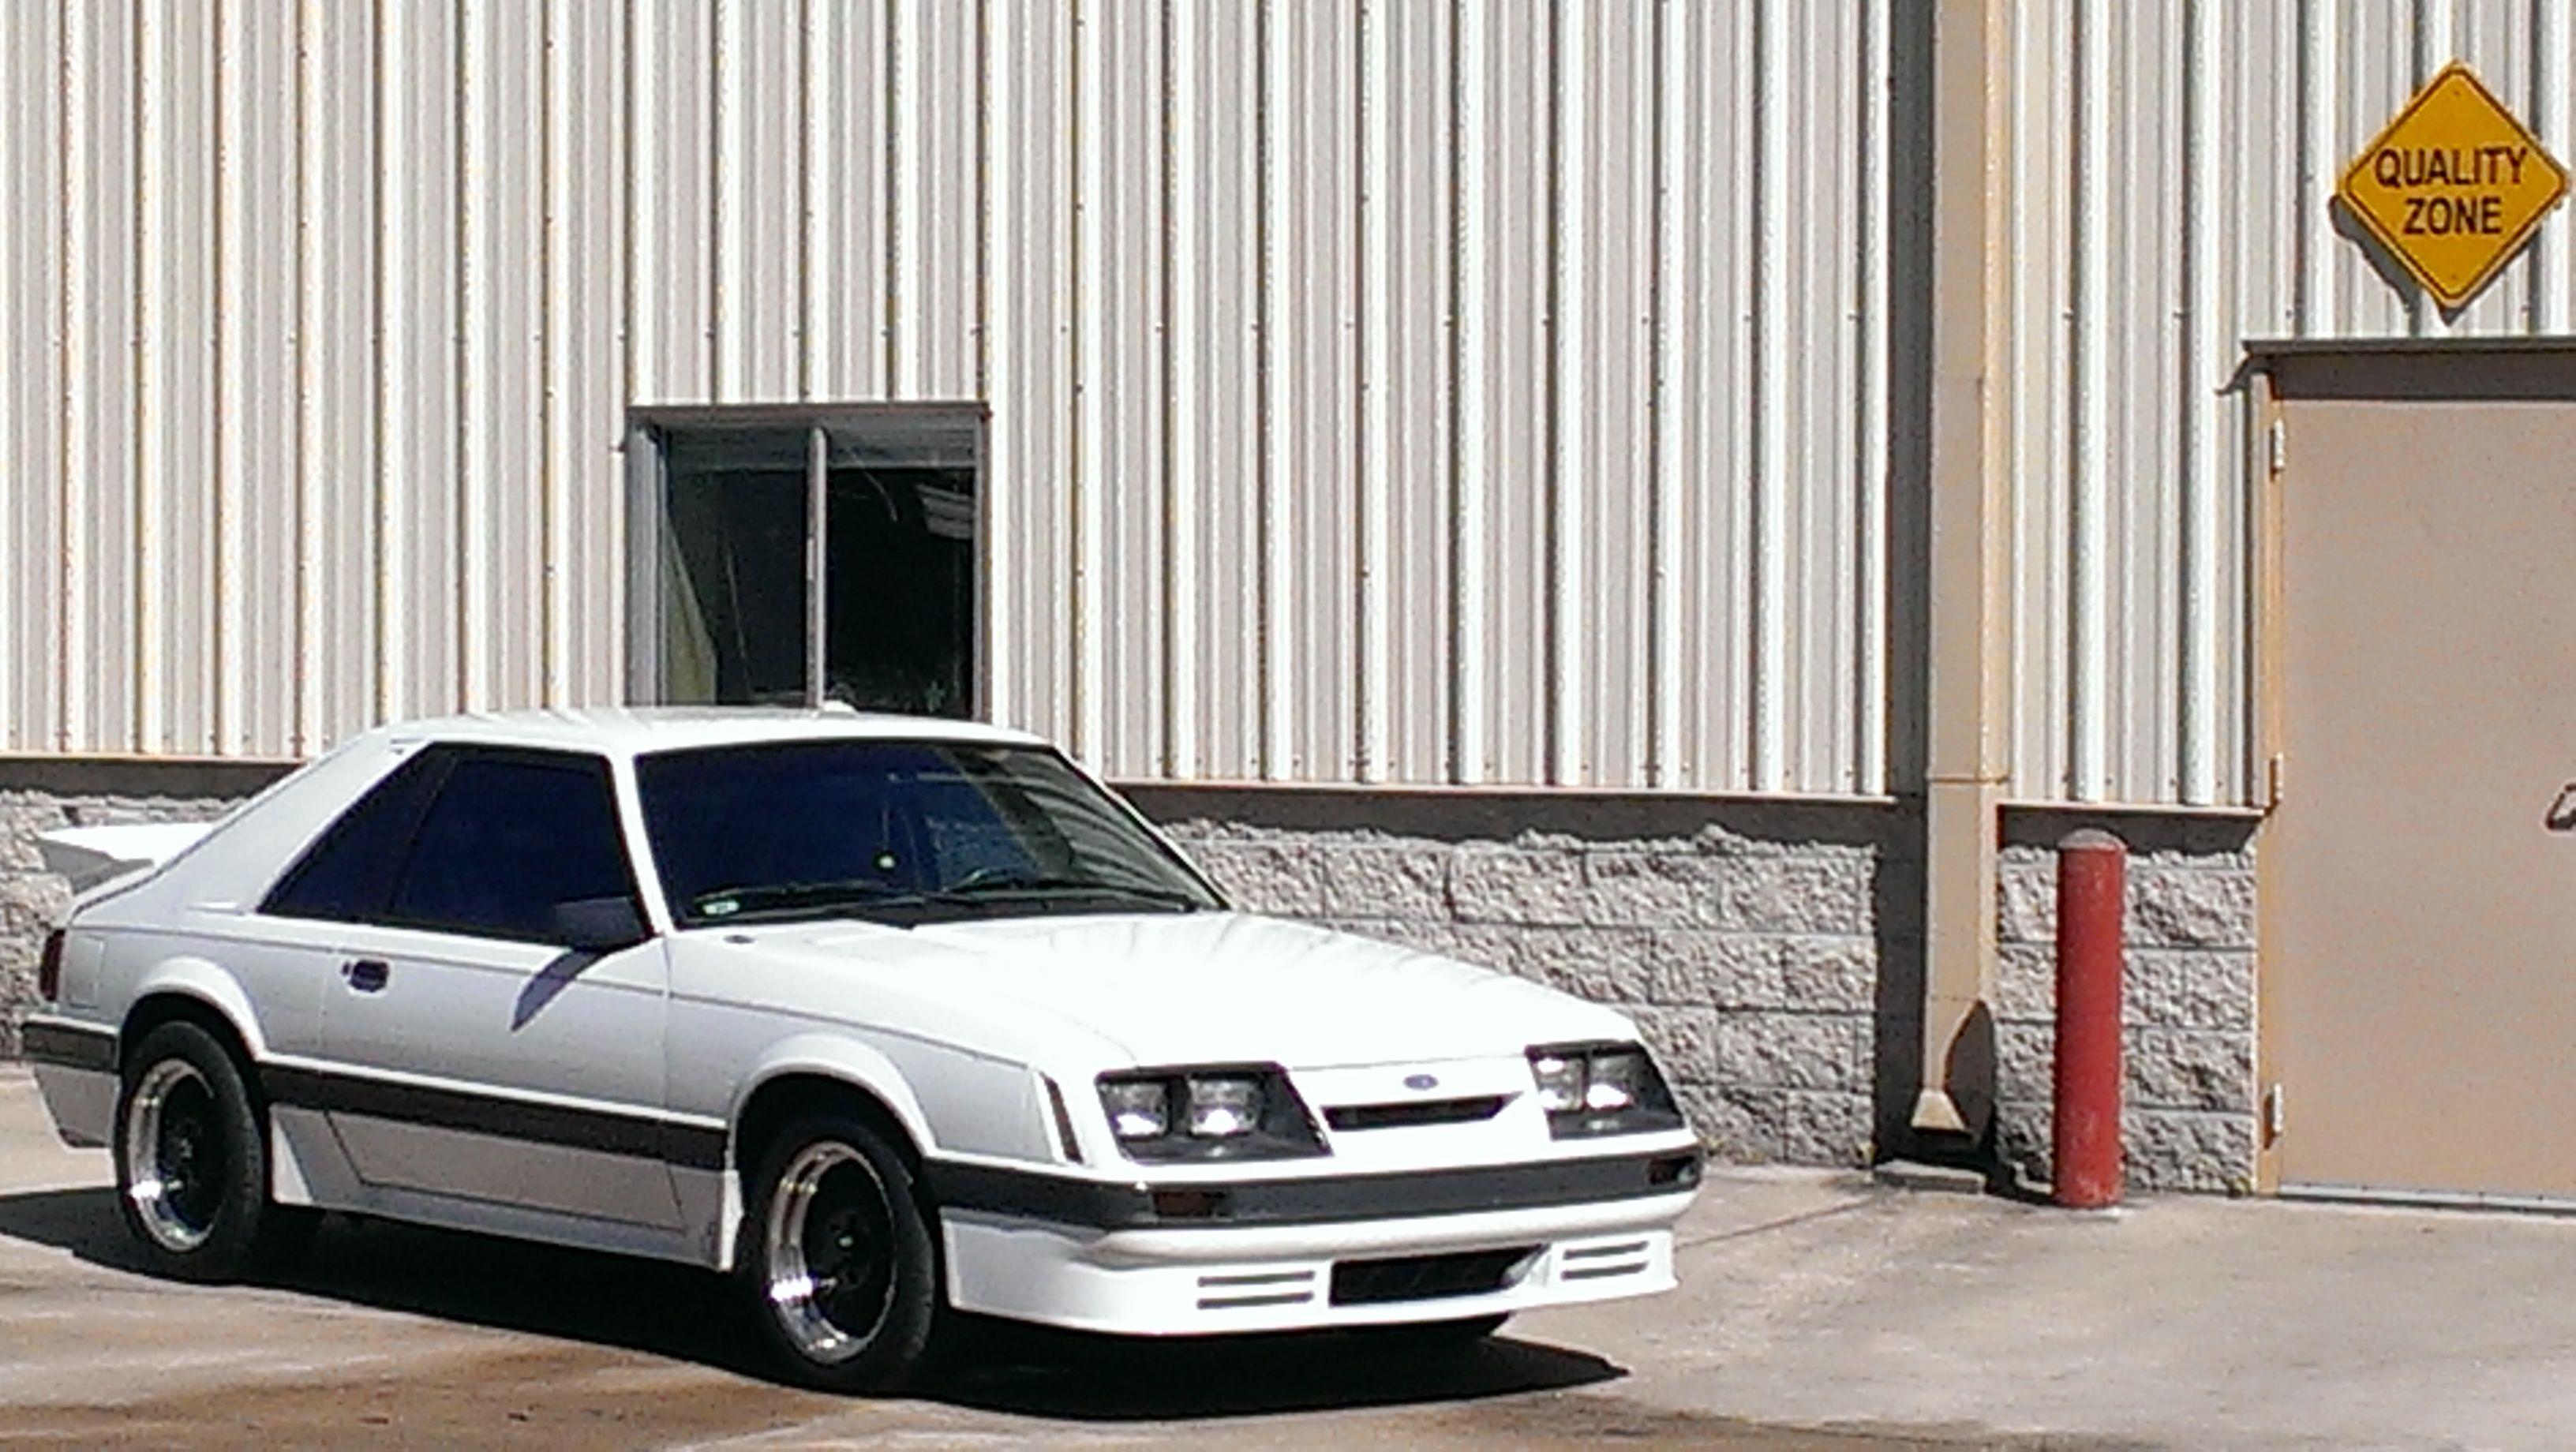 My ride 1986 mustang gt Saleen clone  Foxbody Mustang  Pinterest